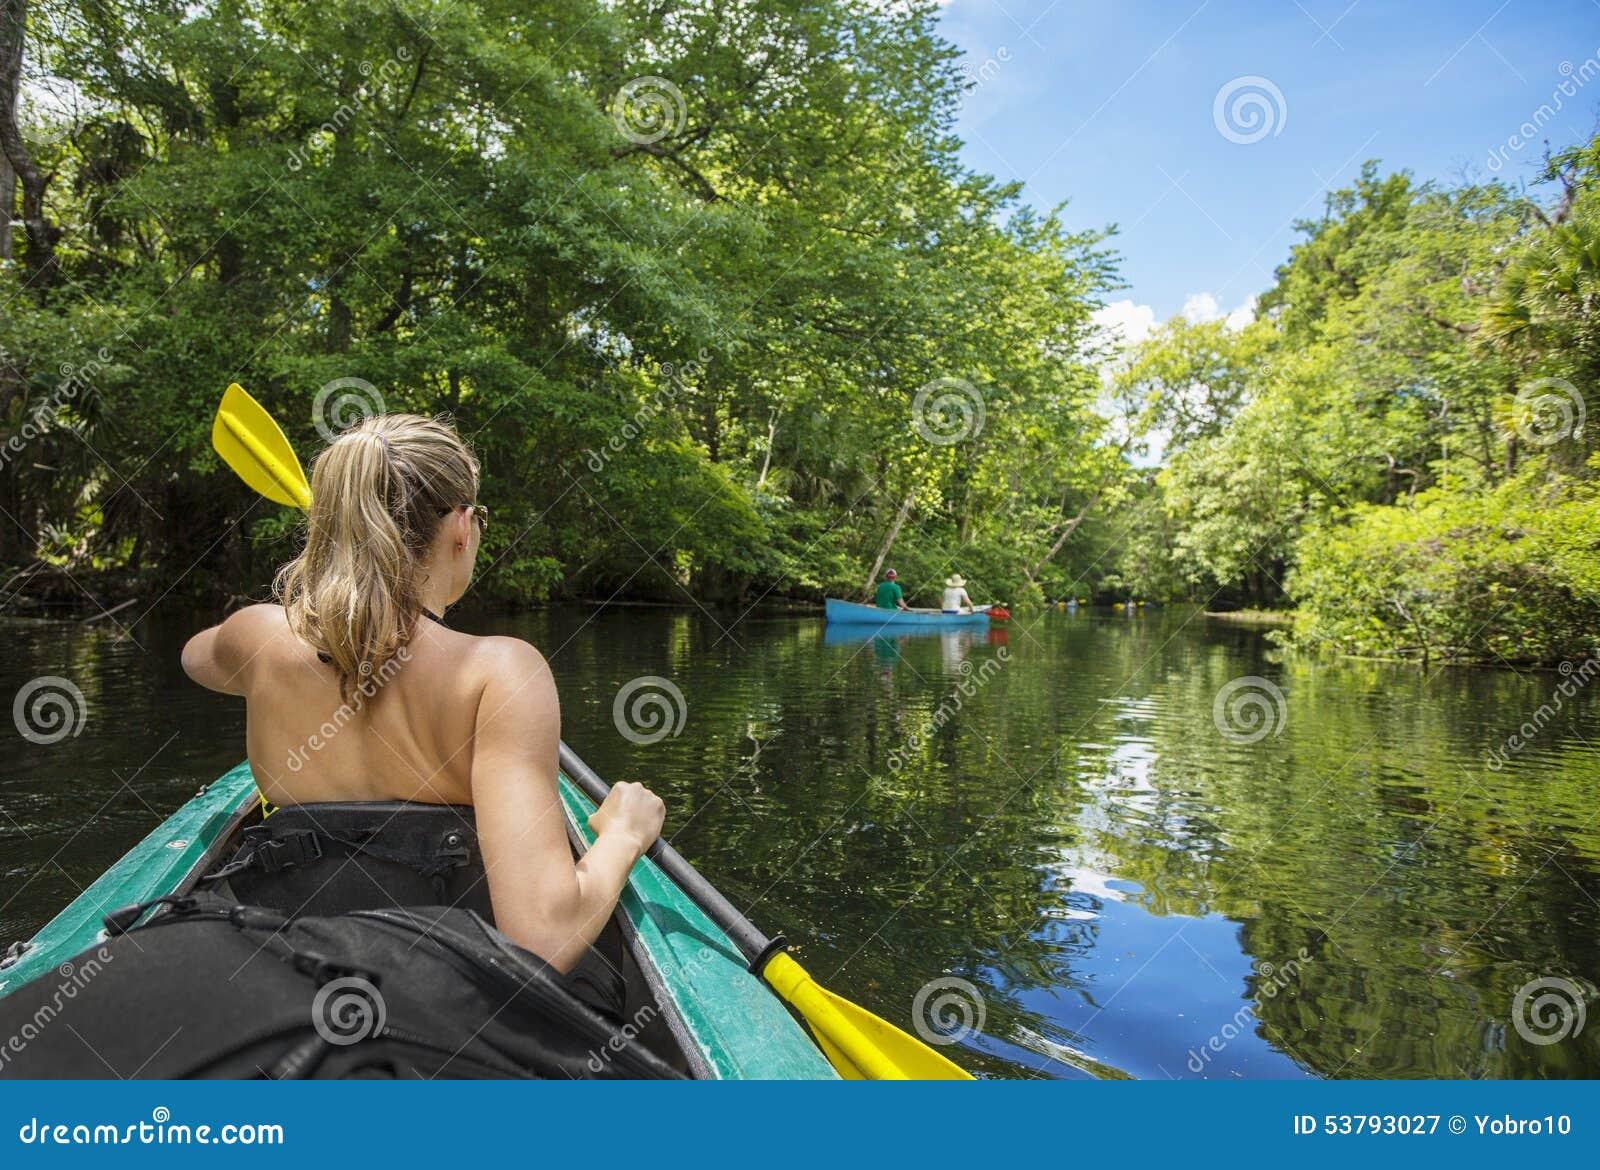 Woman Kayaking Down A Beautiful Tropical Jungle River